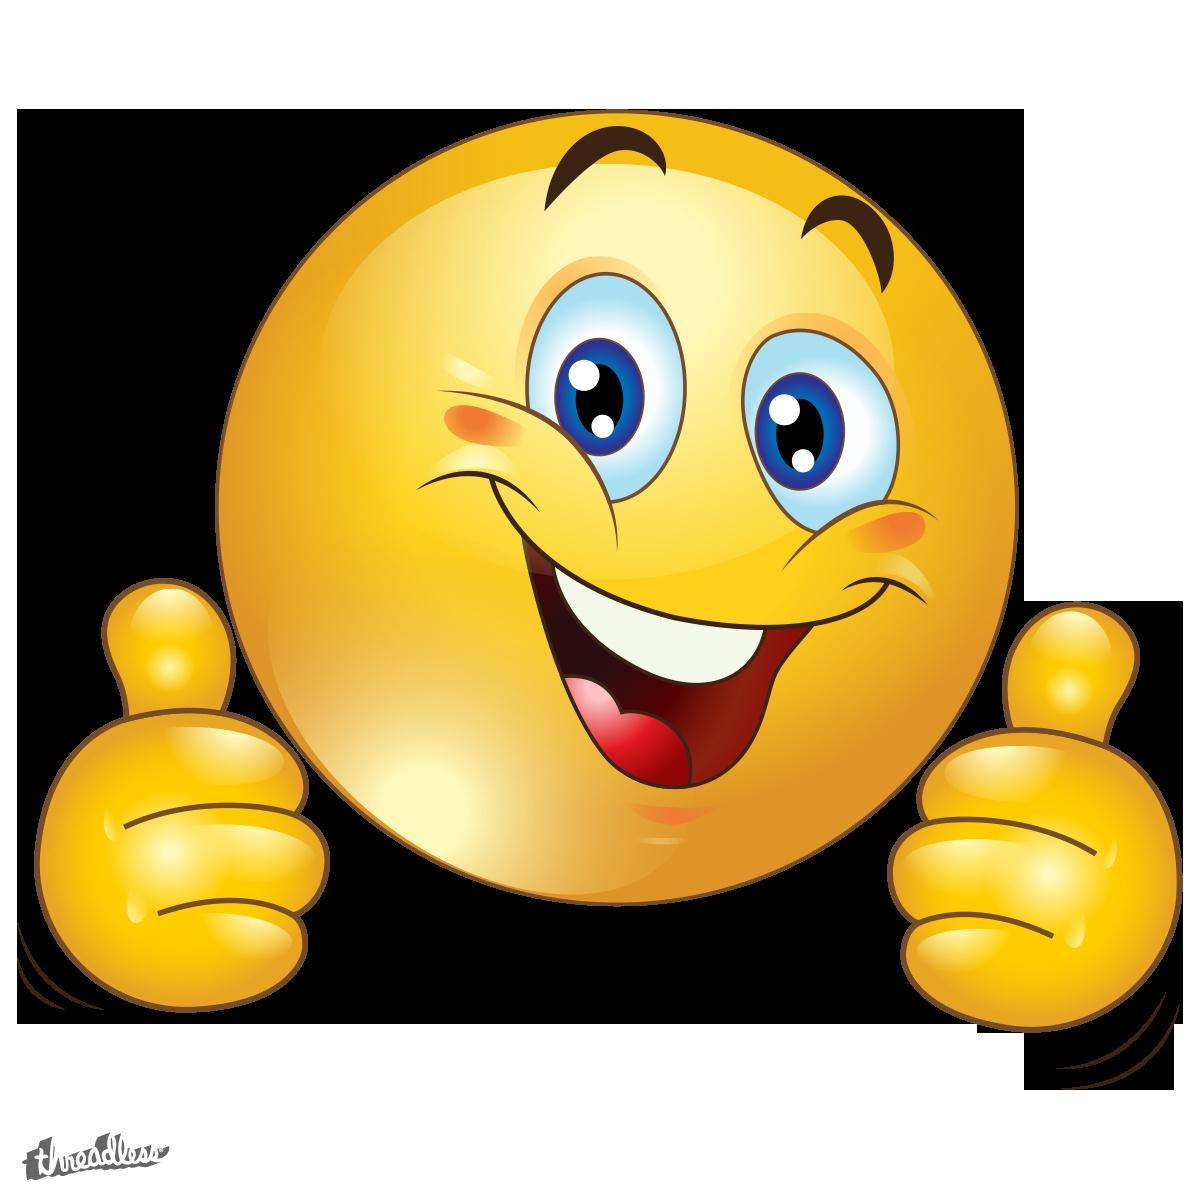 Score okay smiley by Vladimirr on Threadless